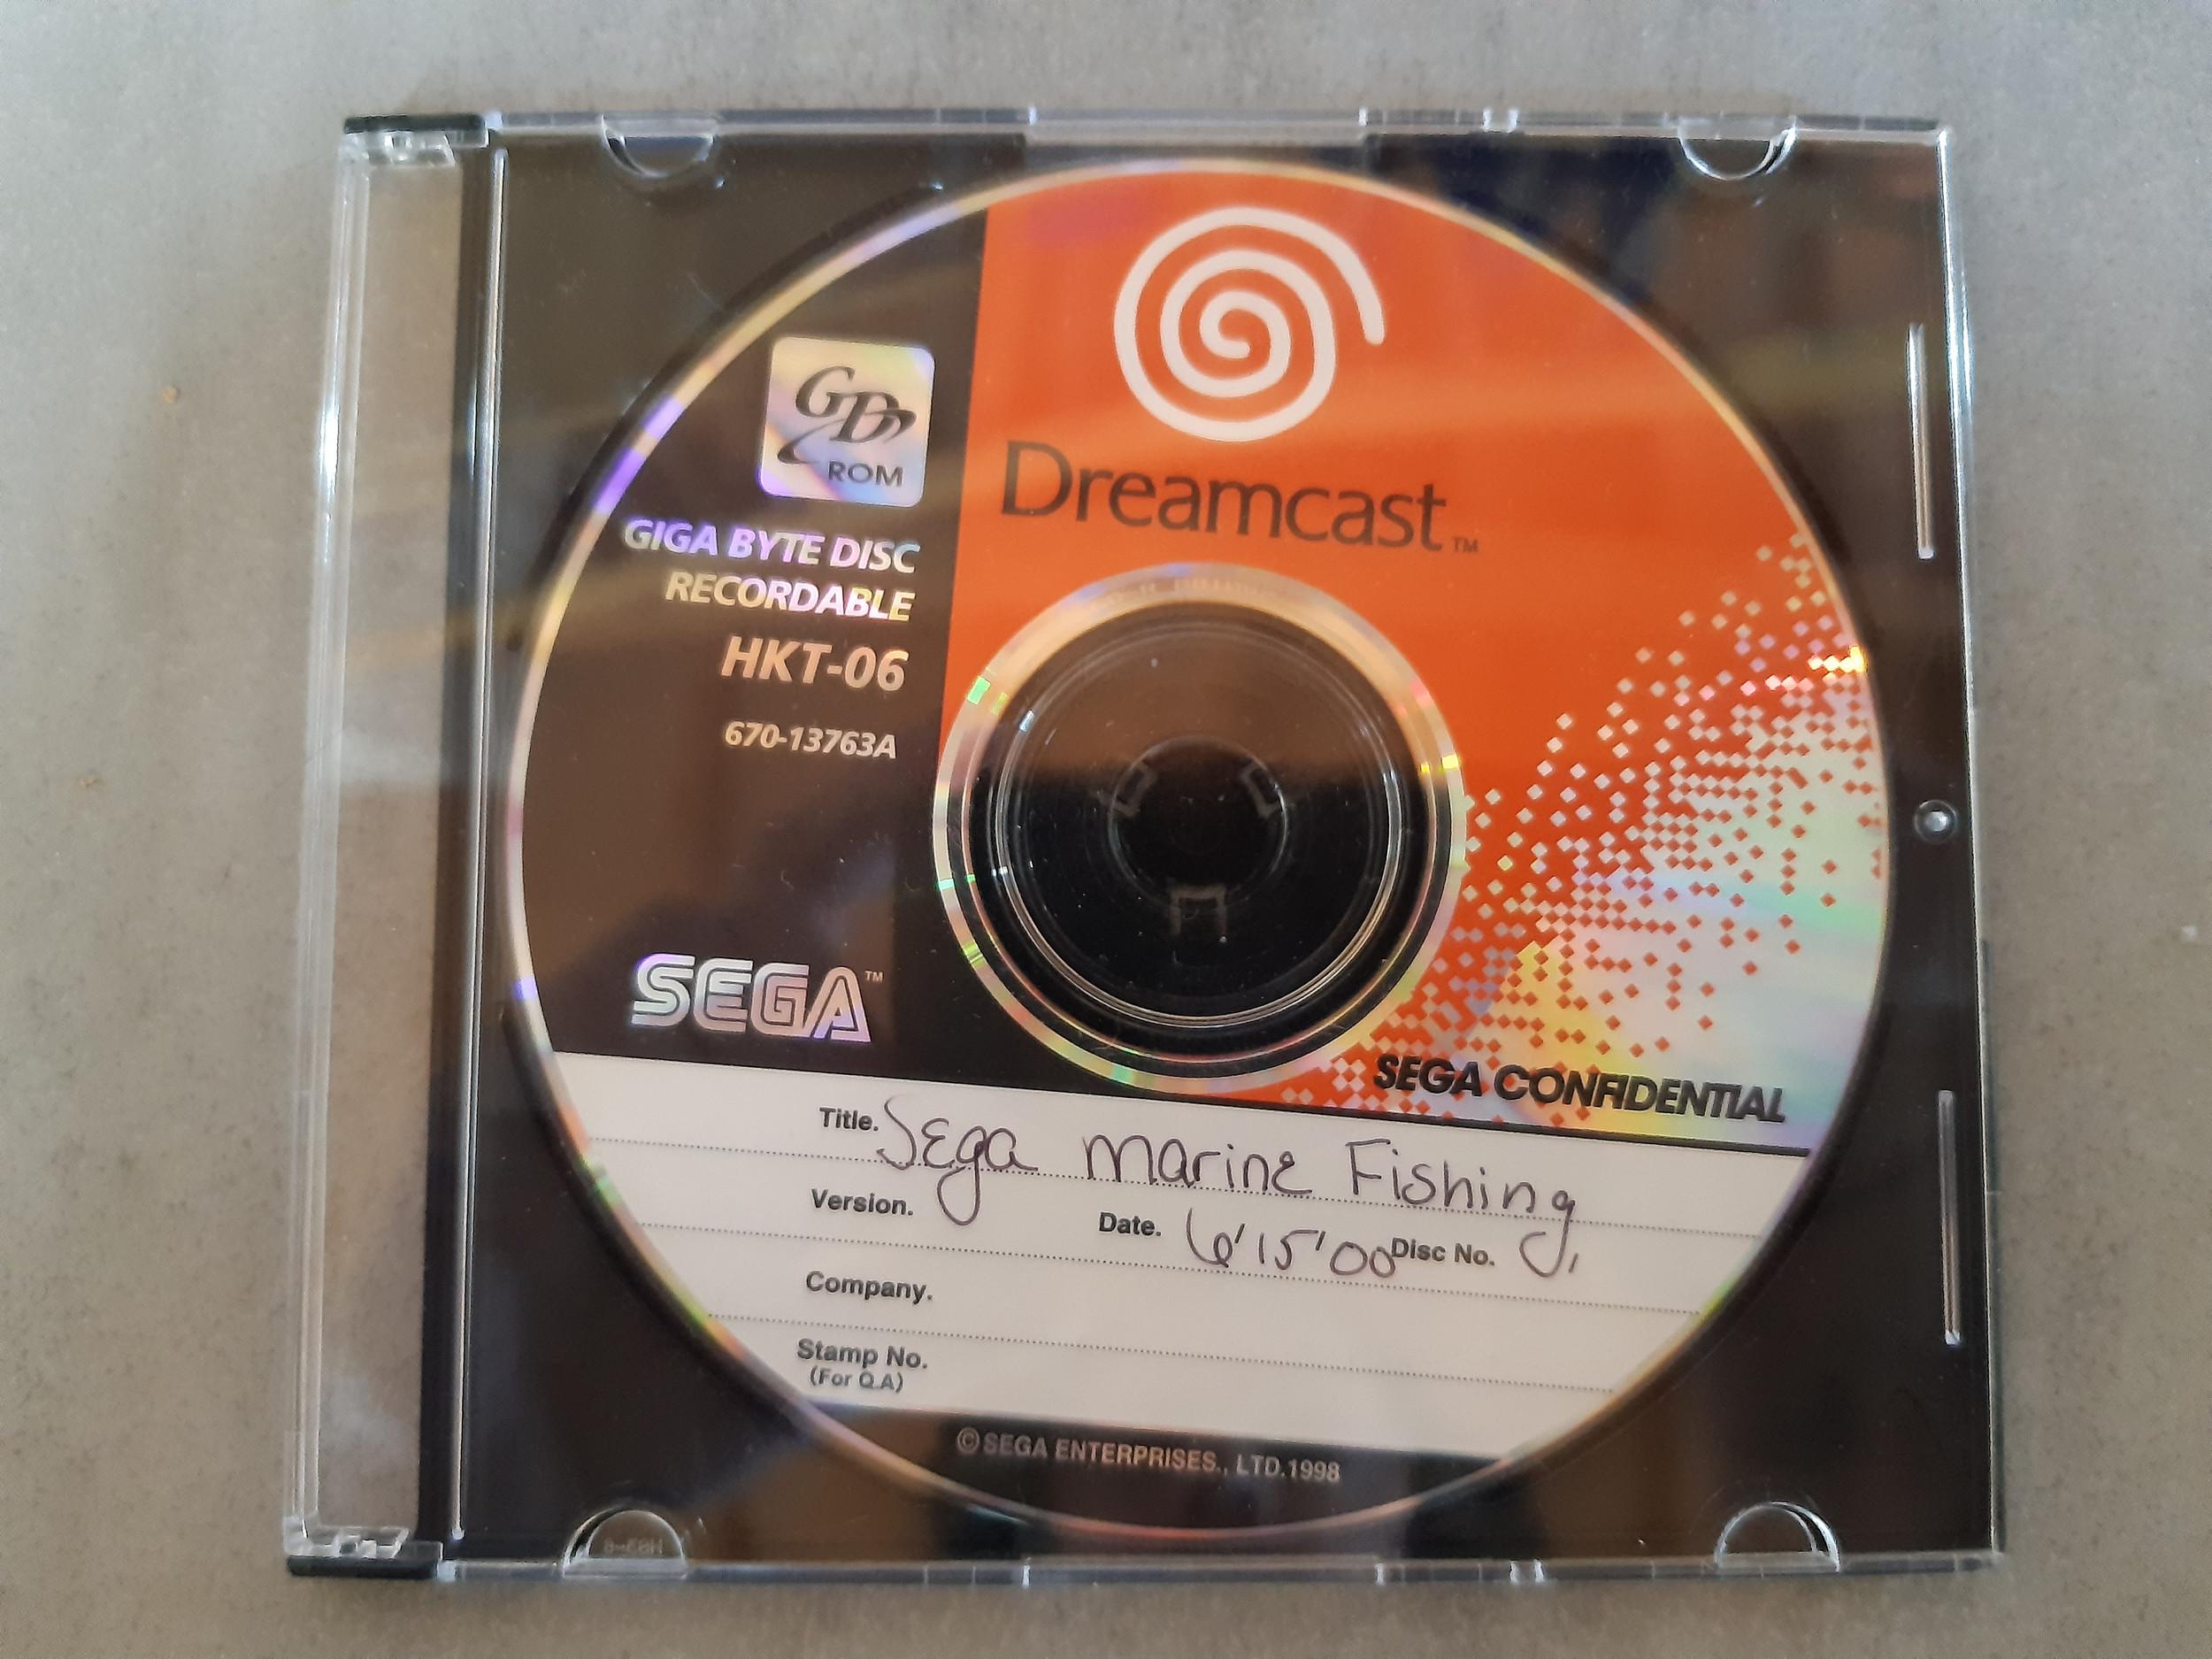 www.sega-dreamcast-info-games-preservation.com